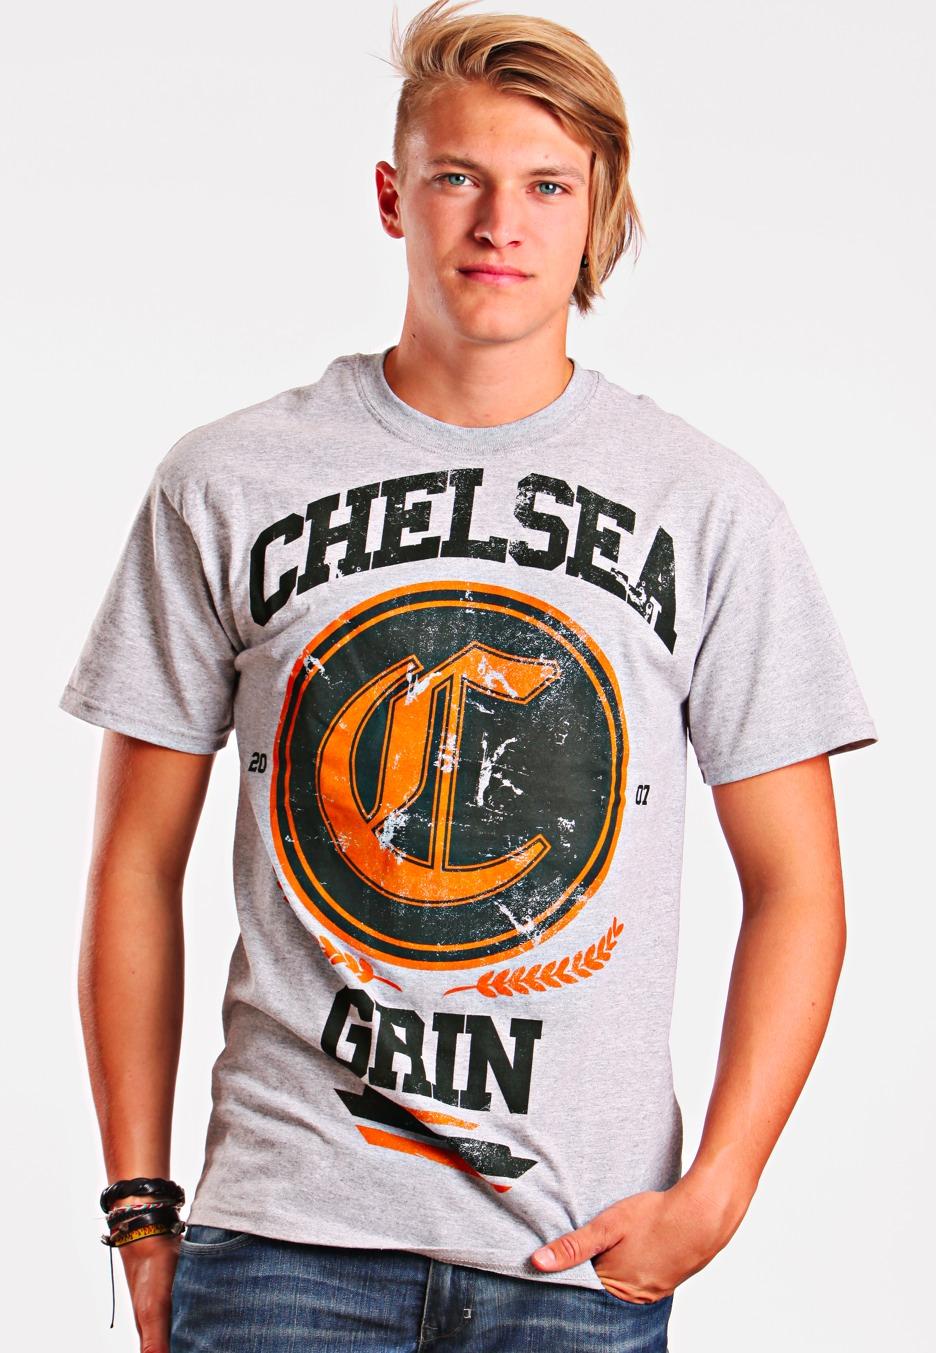 chelsea grin college sportsgrey t shirt official metalcore merchandise shop impericon. Black Bedroom Furniture Sets. Home Design Ideas